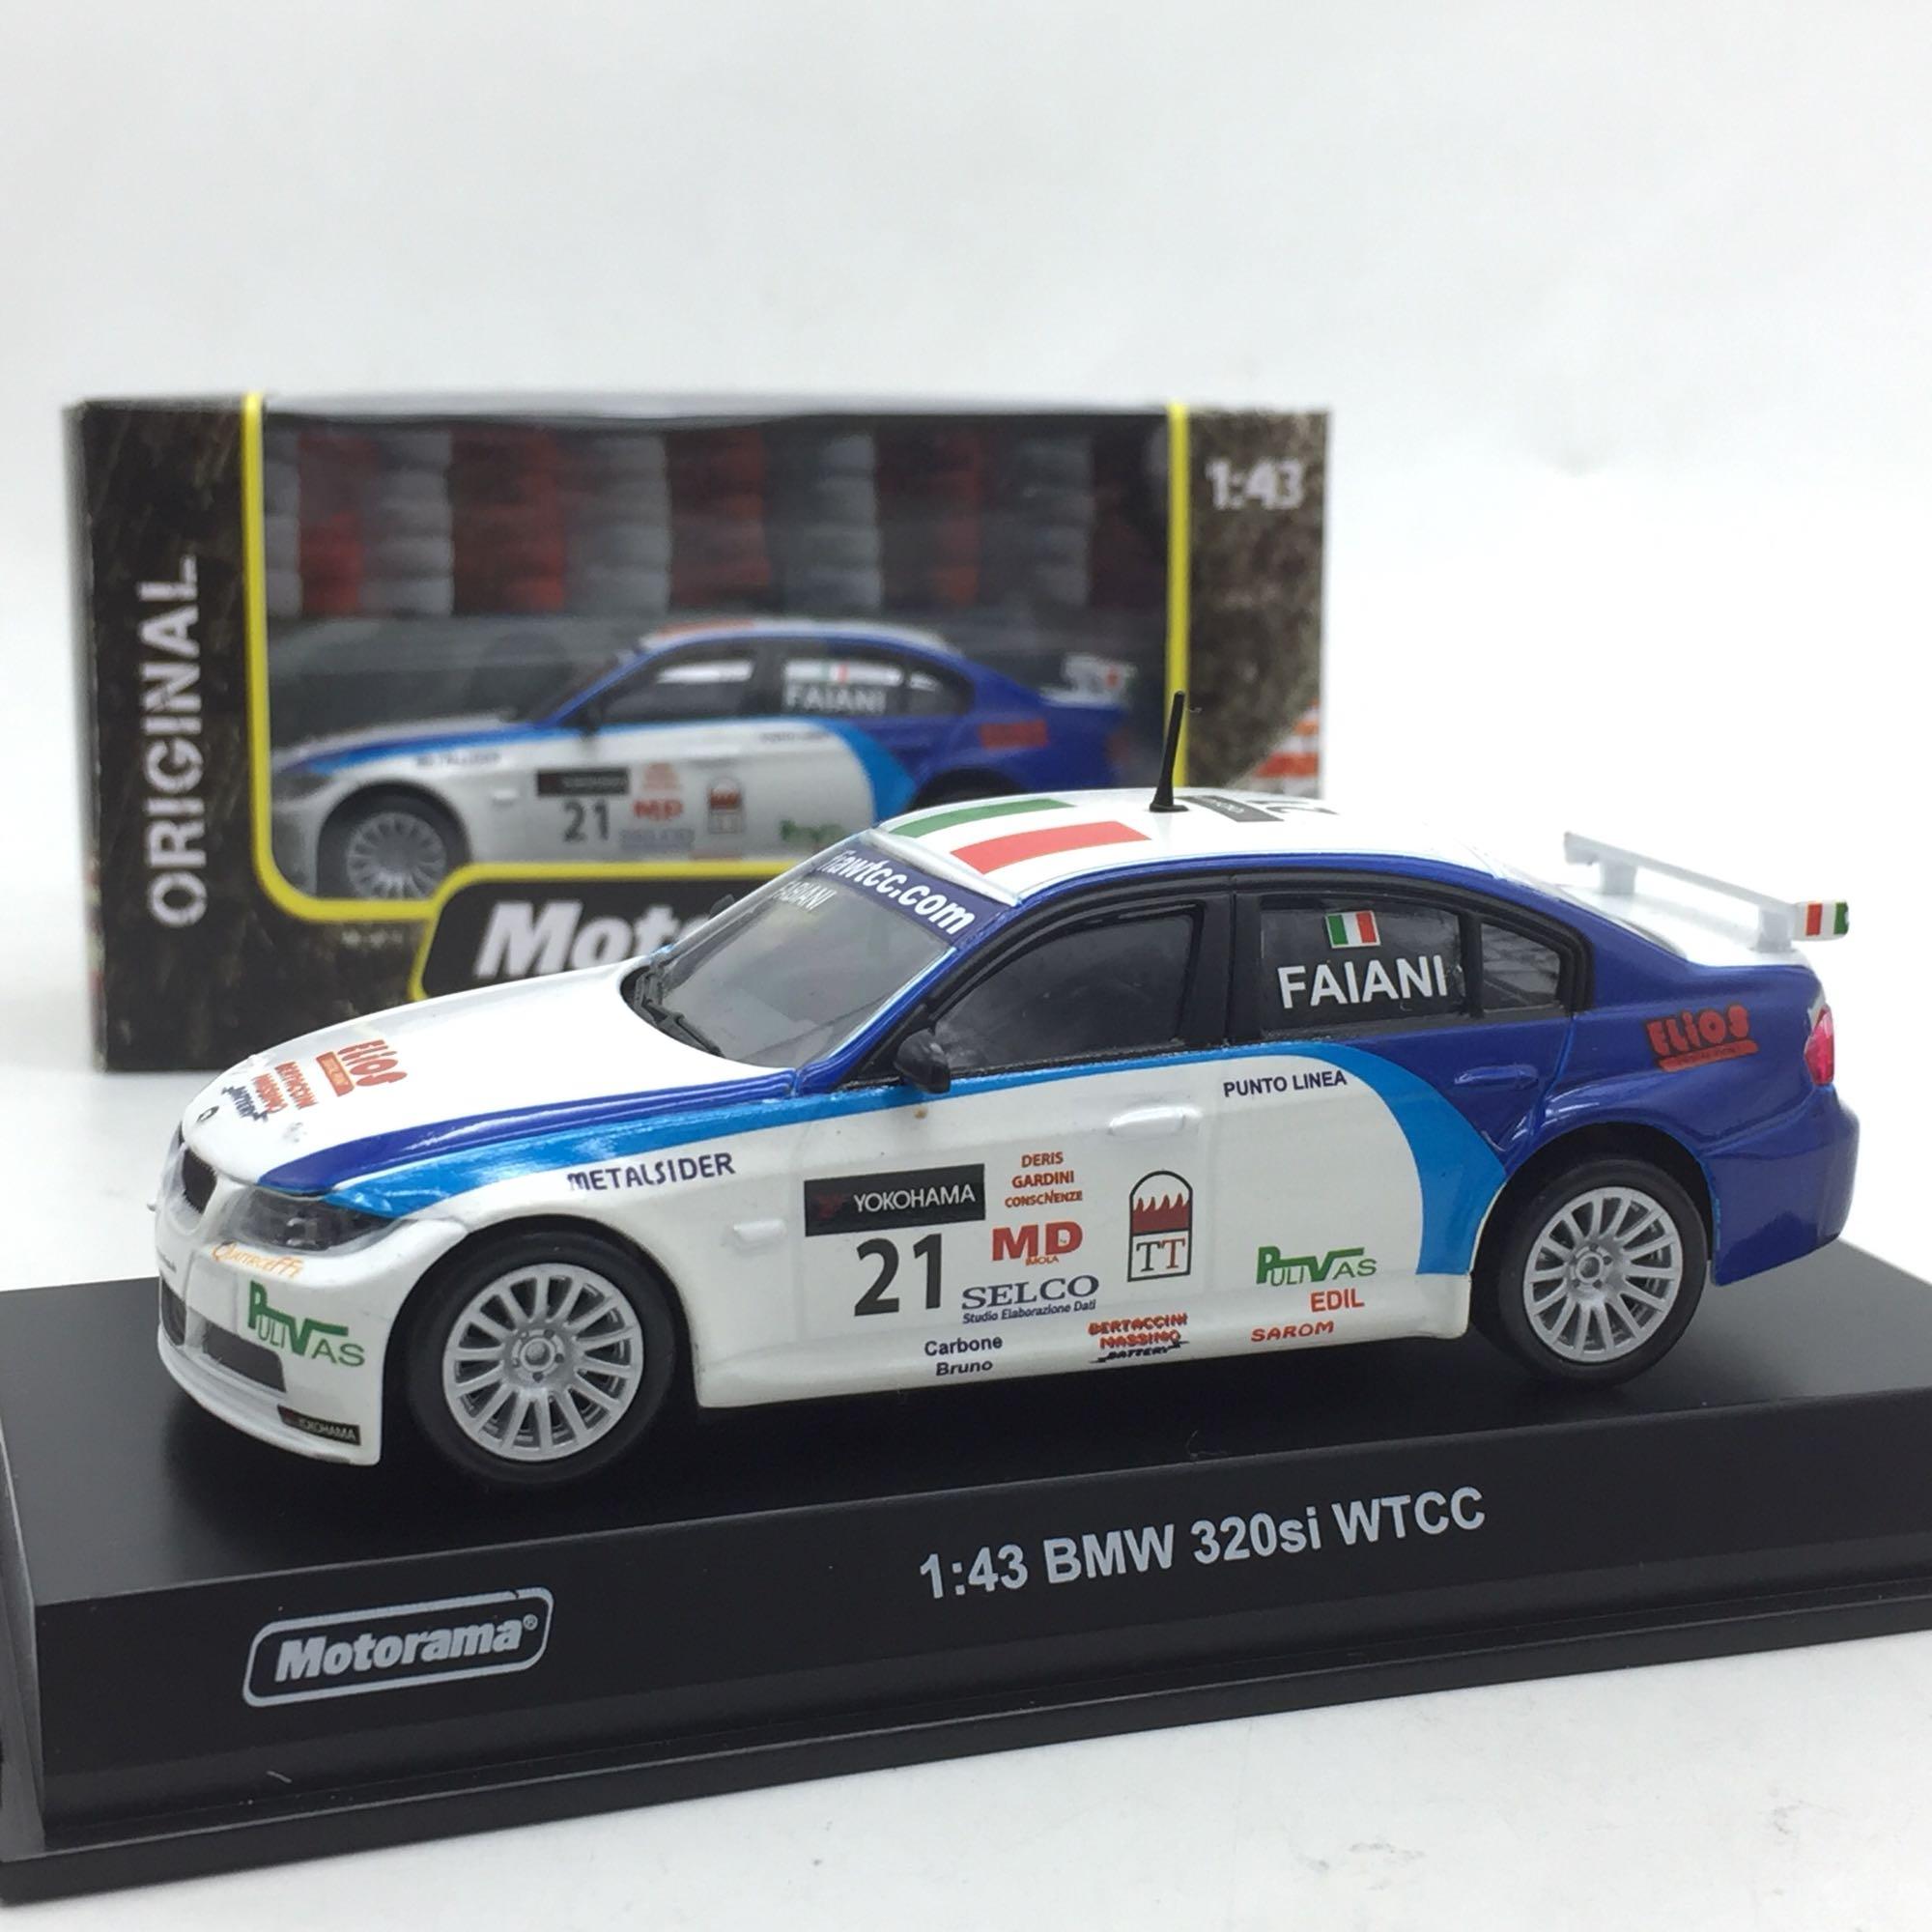 WTCC Racing Car 1:43 BMW 320si Alloy Car Model Collection Toy